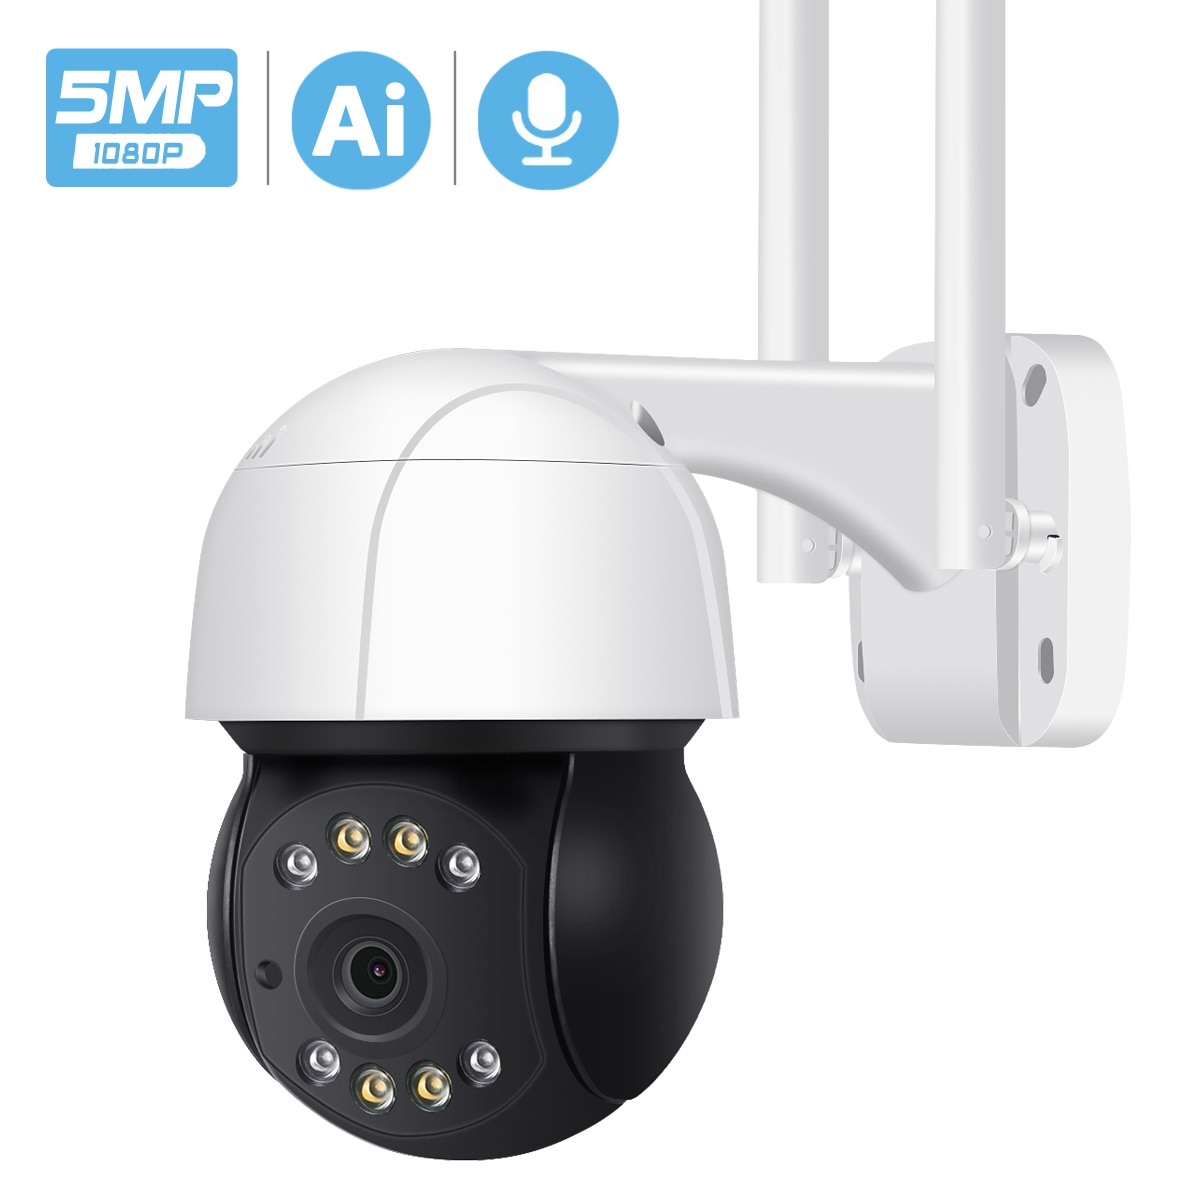 5MP PTZ واي فاي كاميرا IP في الهواء الطلق AI الإنسان السيارات تتبع كاميرا لا سلكية الصوت 2MP 3MP الذكية الأمن CCTV IP كاميرا سحابة التخزين